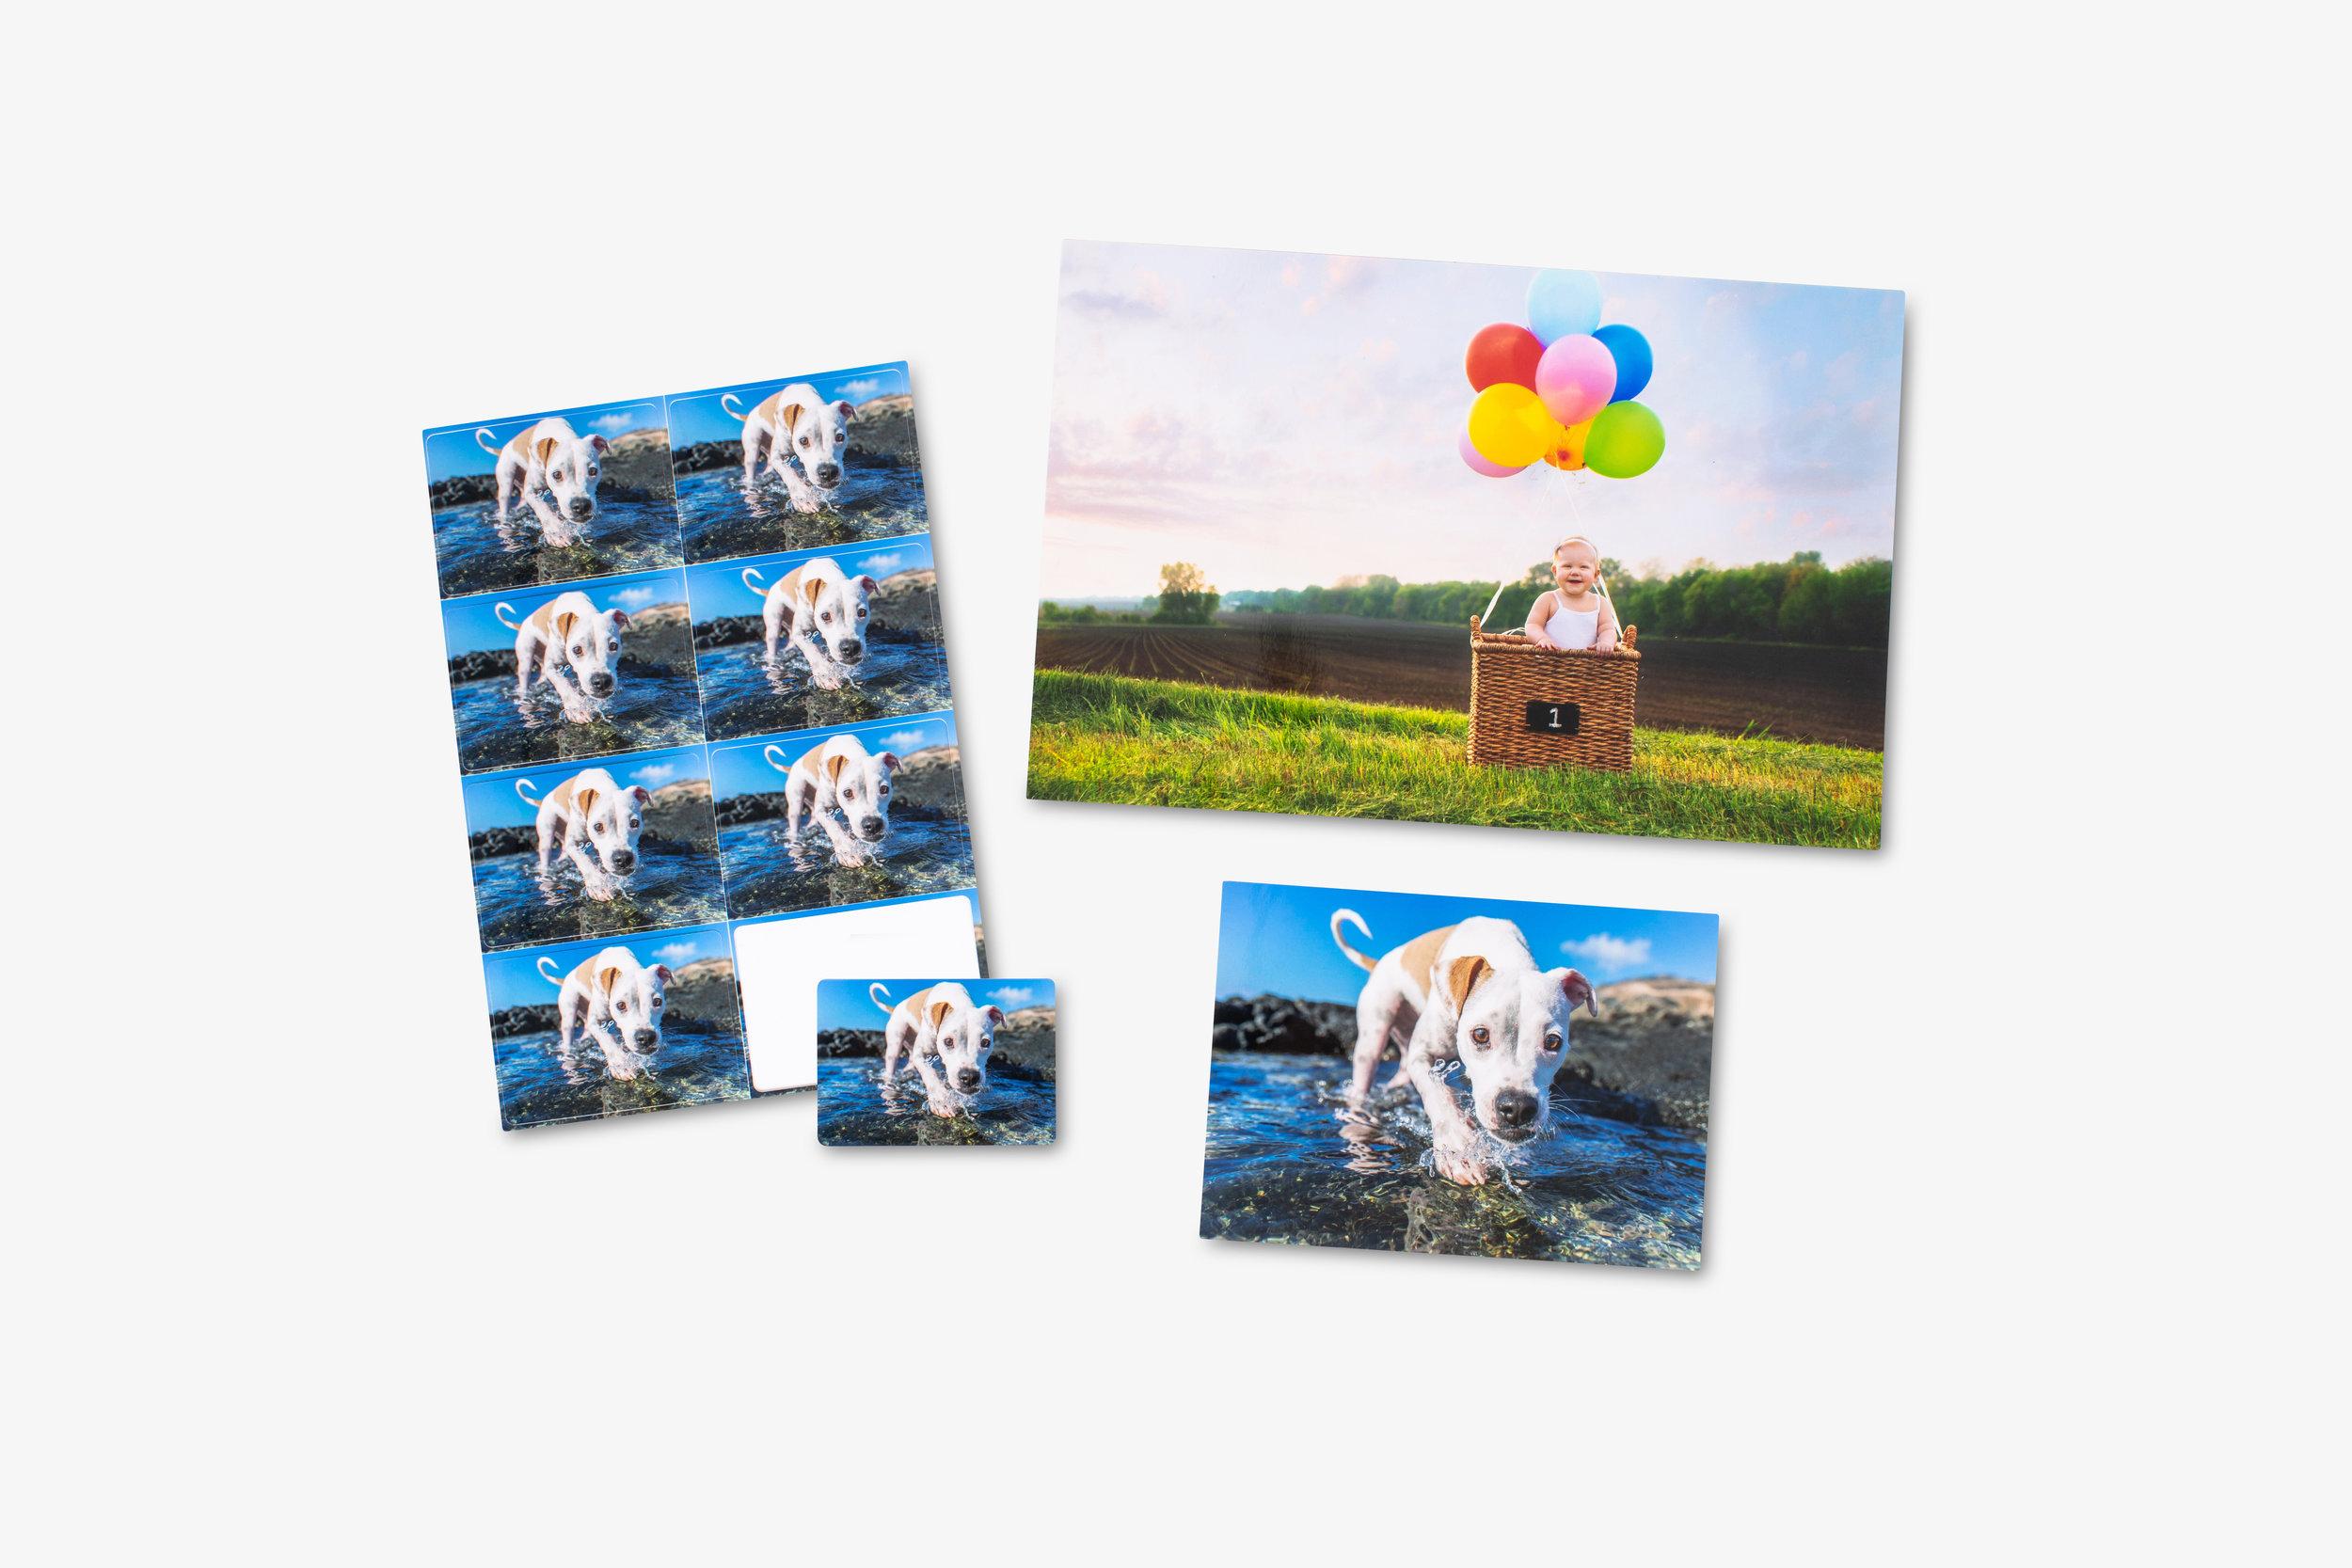 Fuji Professional Metallic Pearl Photo Prints